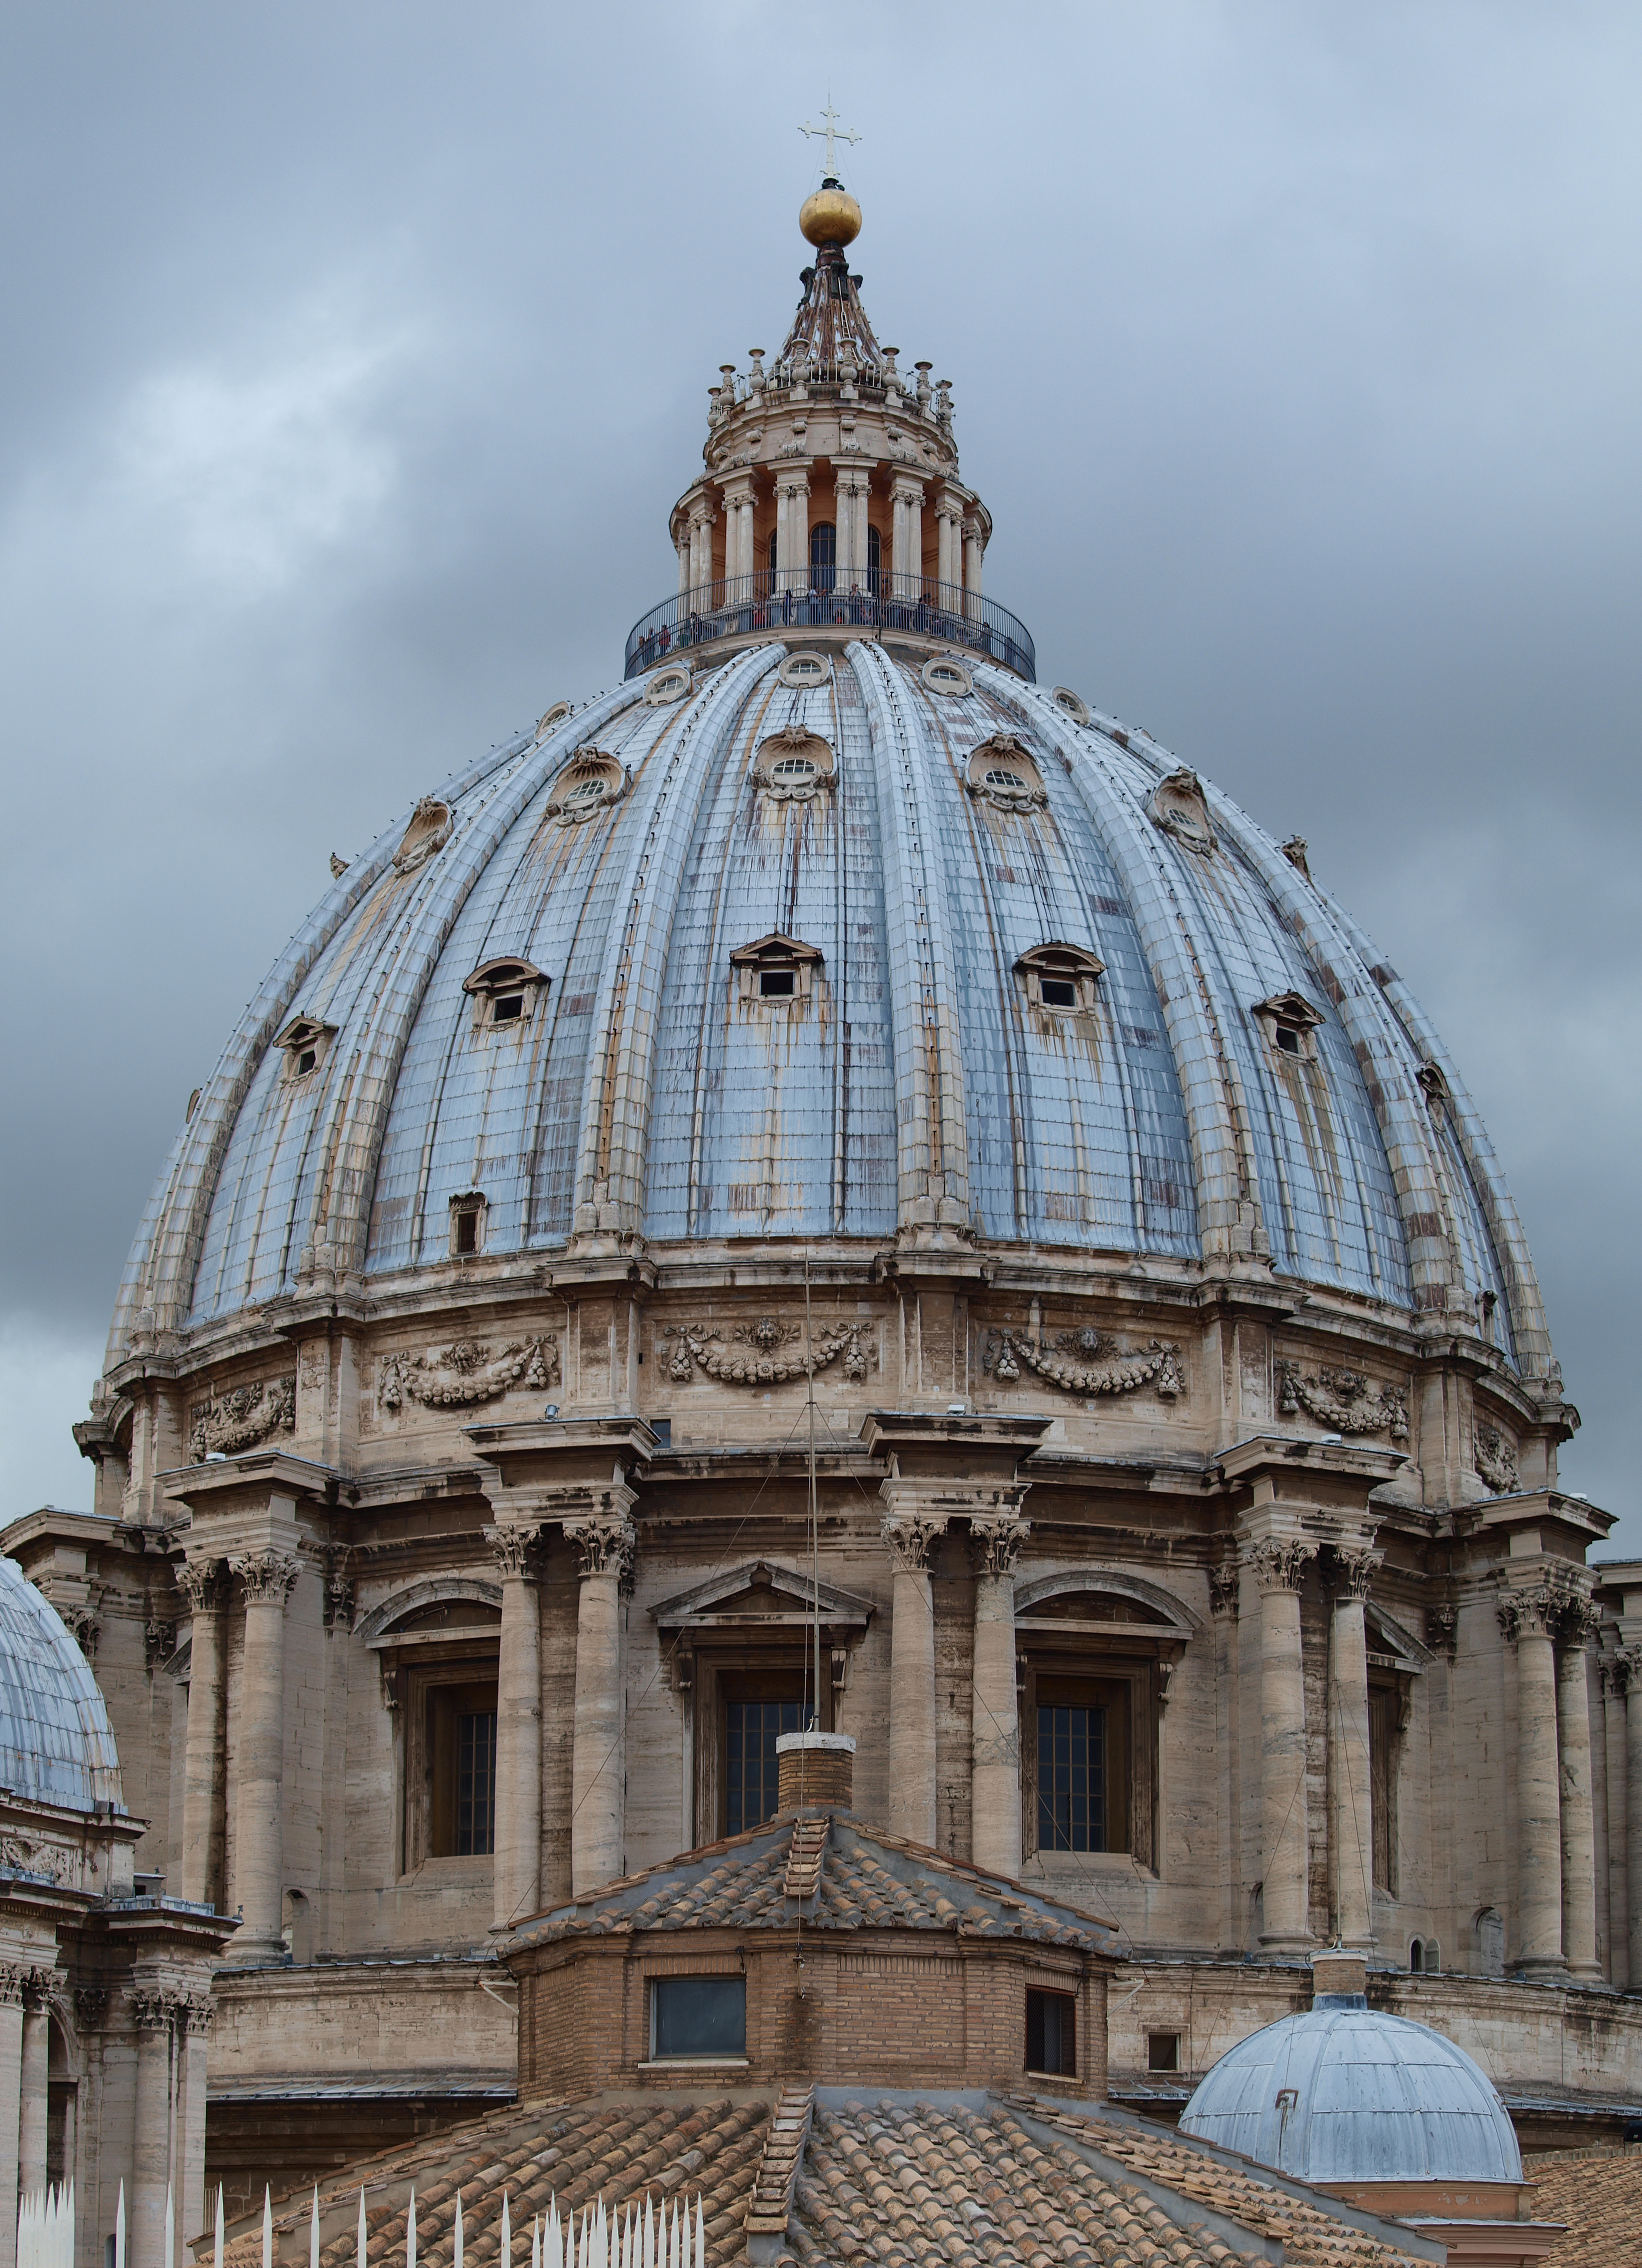 File:Dome of Saint Peter's Basilica (exterior).jpg ...